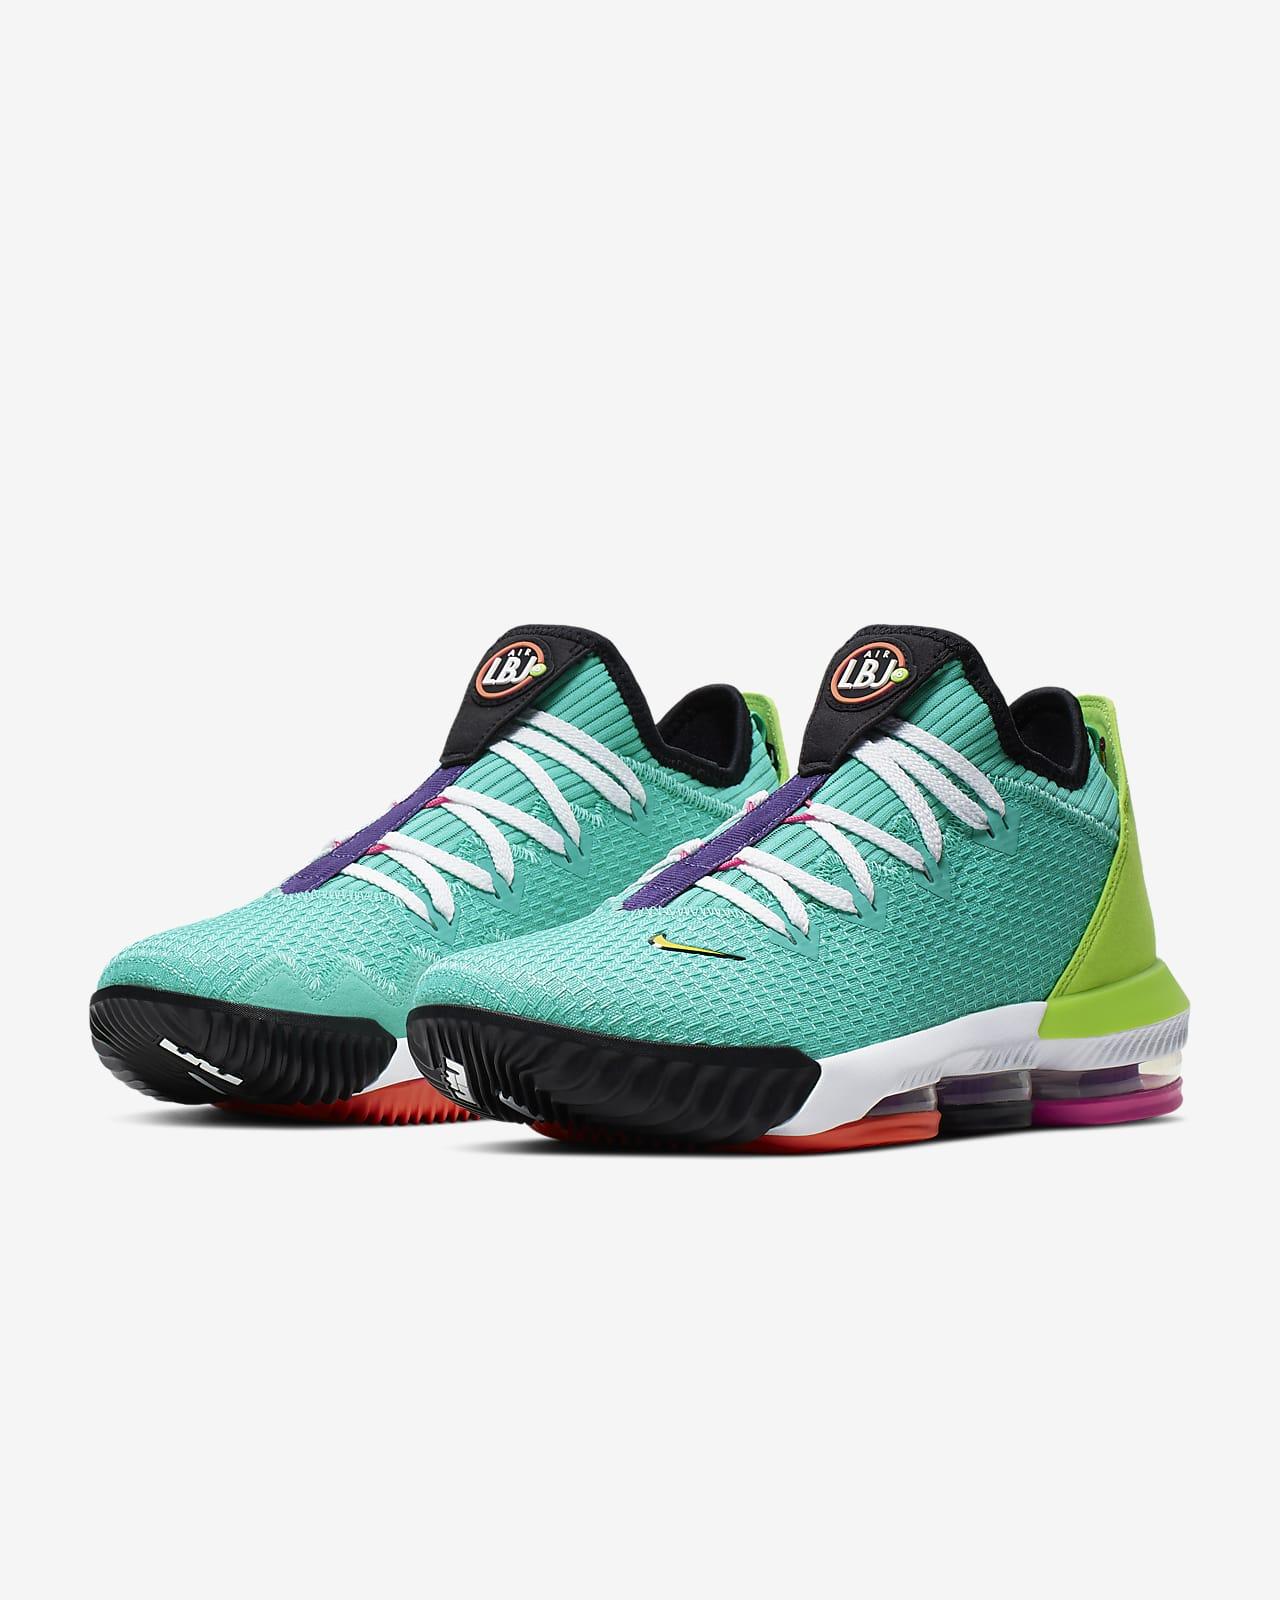 nike basketball shoes low